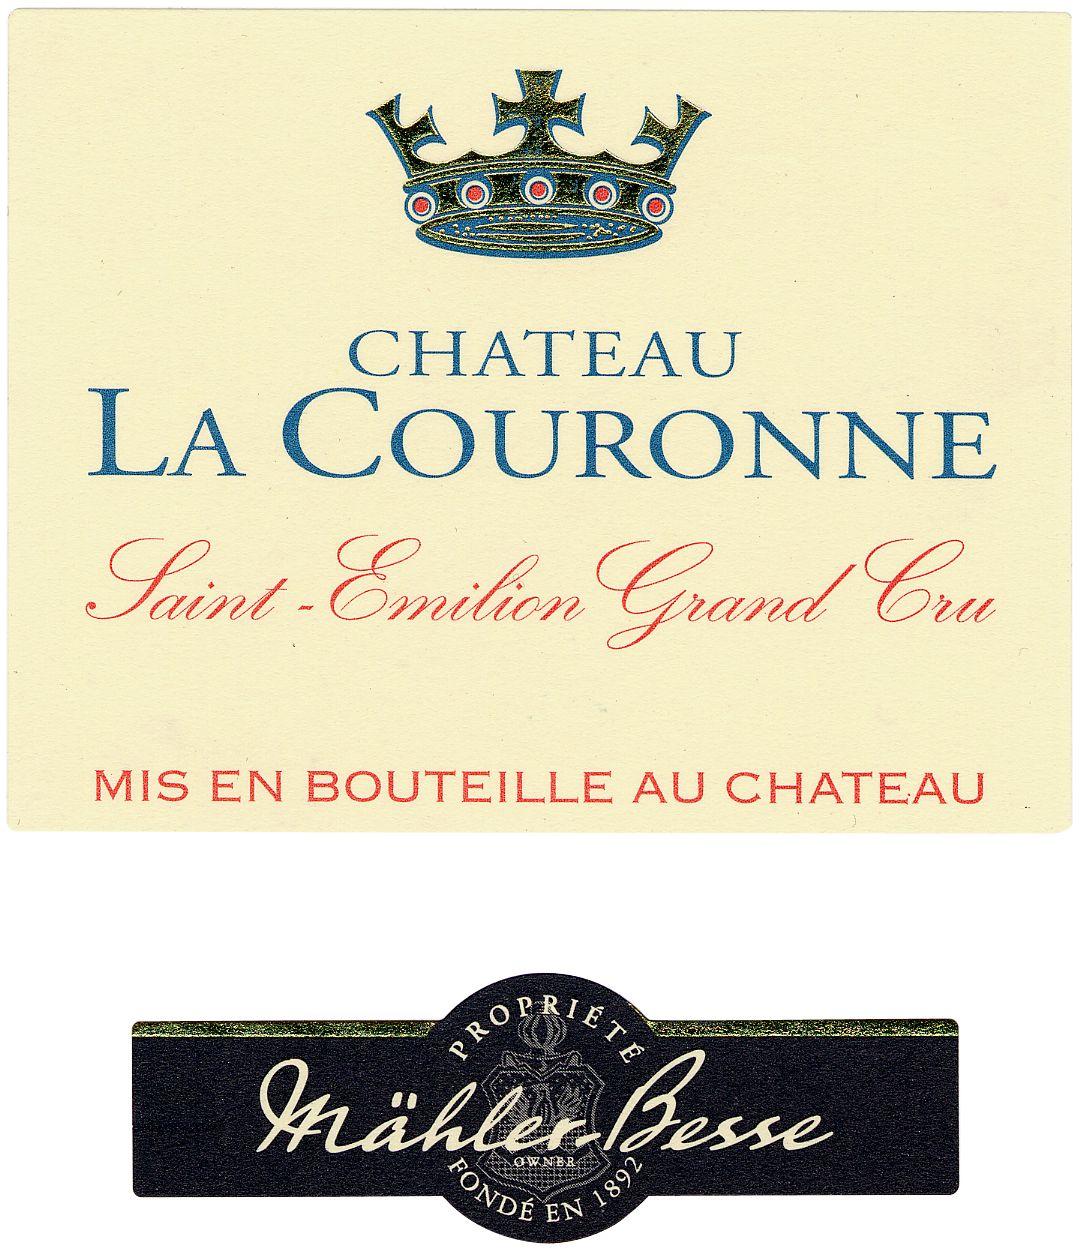 Chateau La Couronne